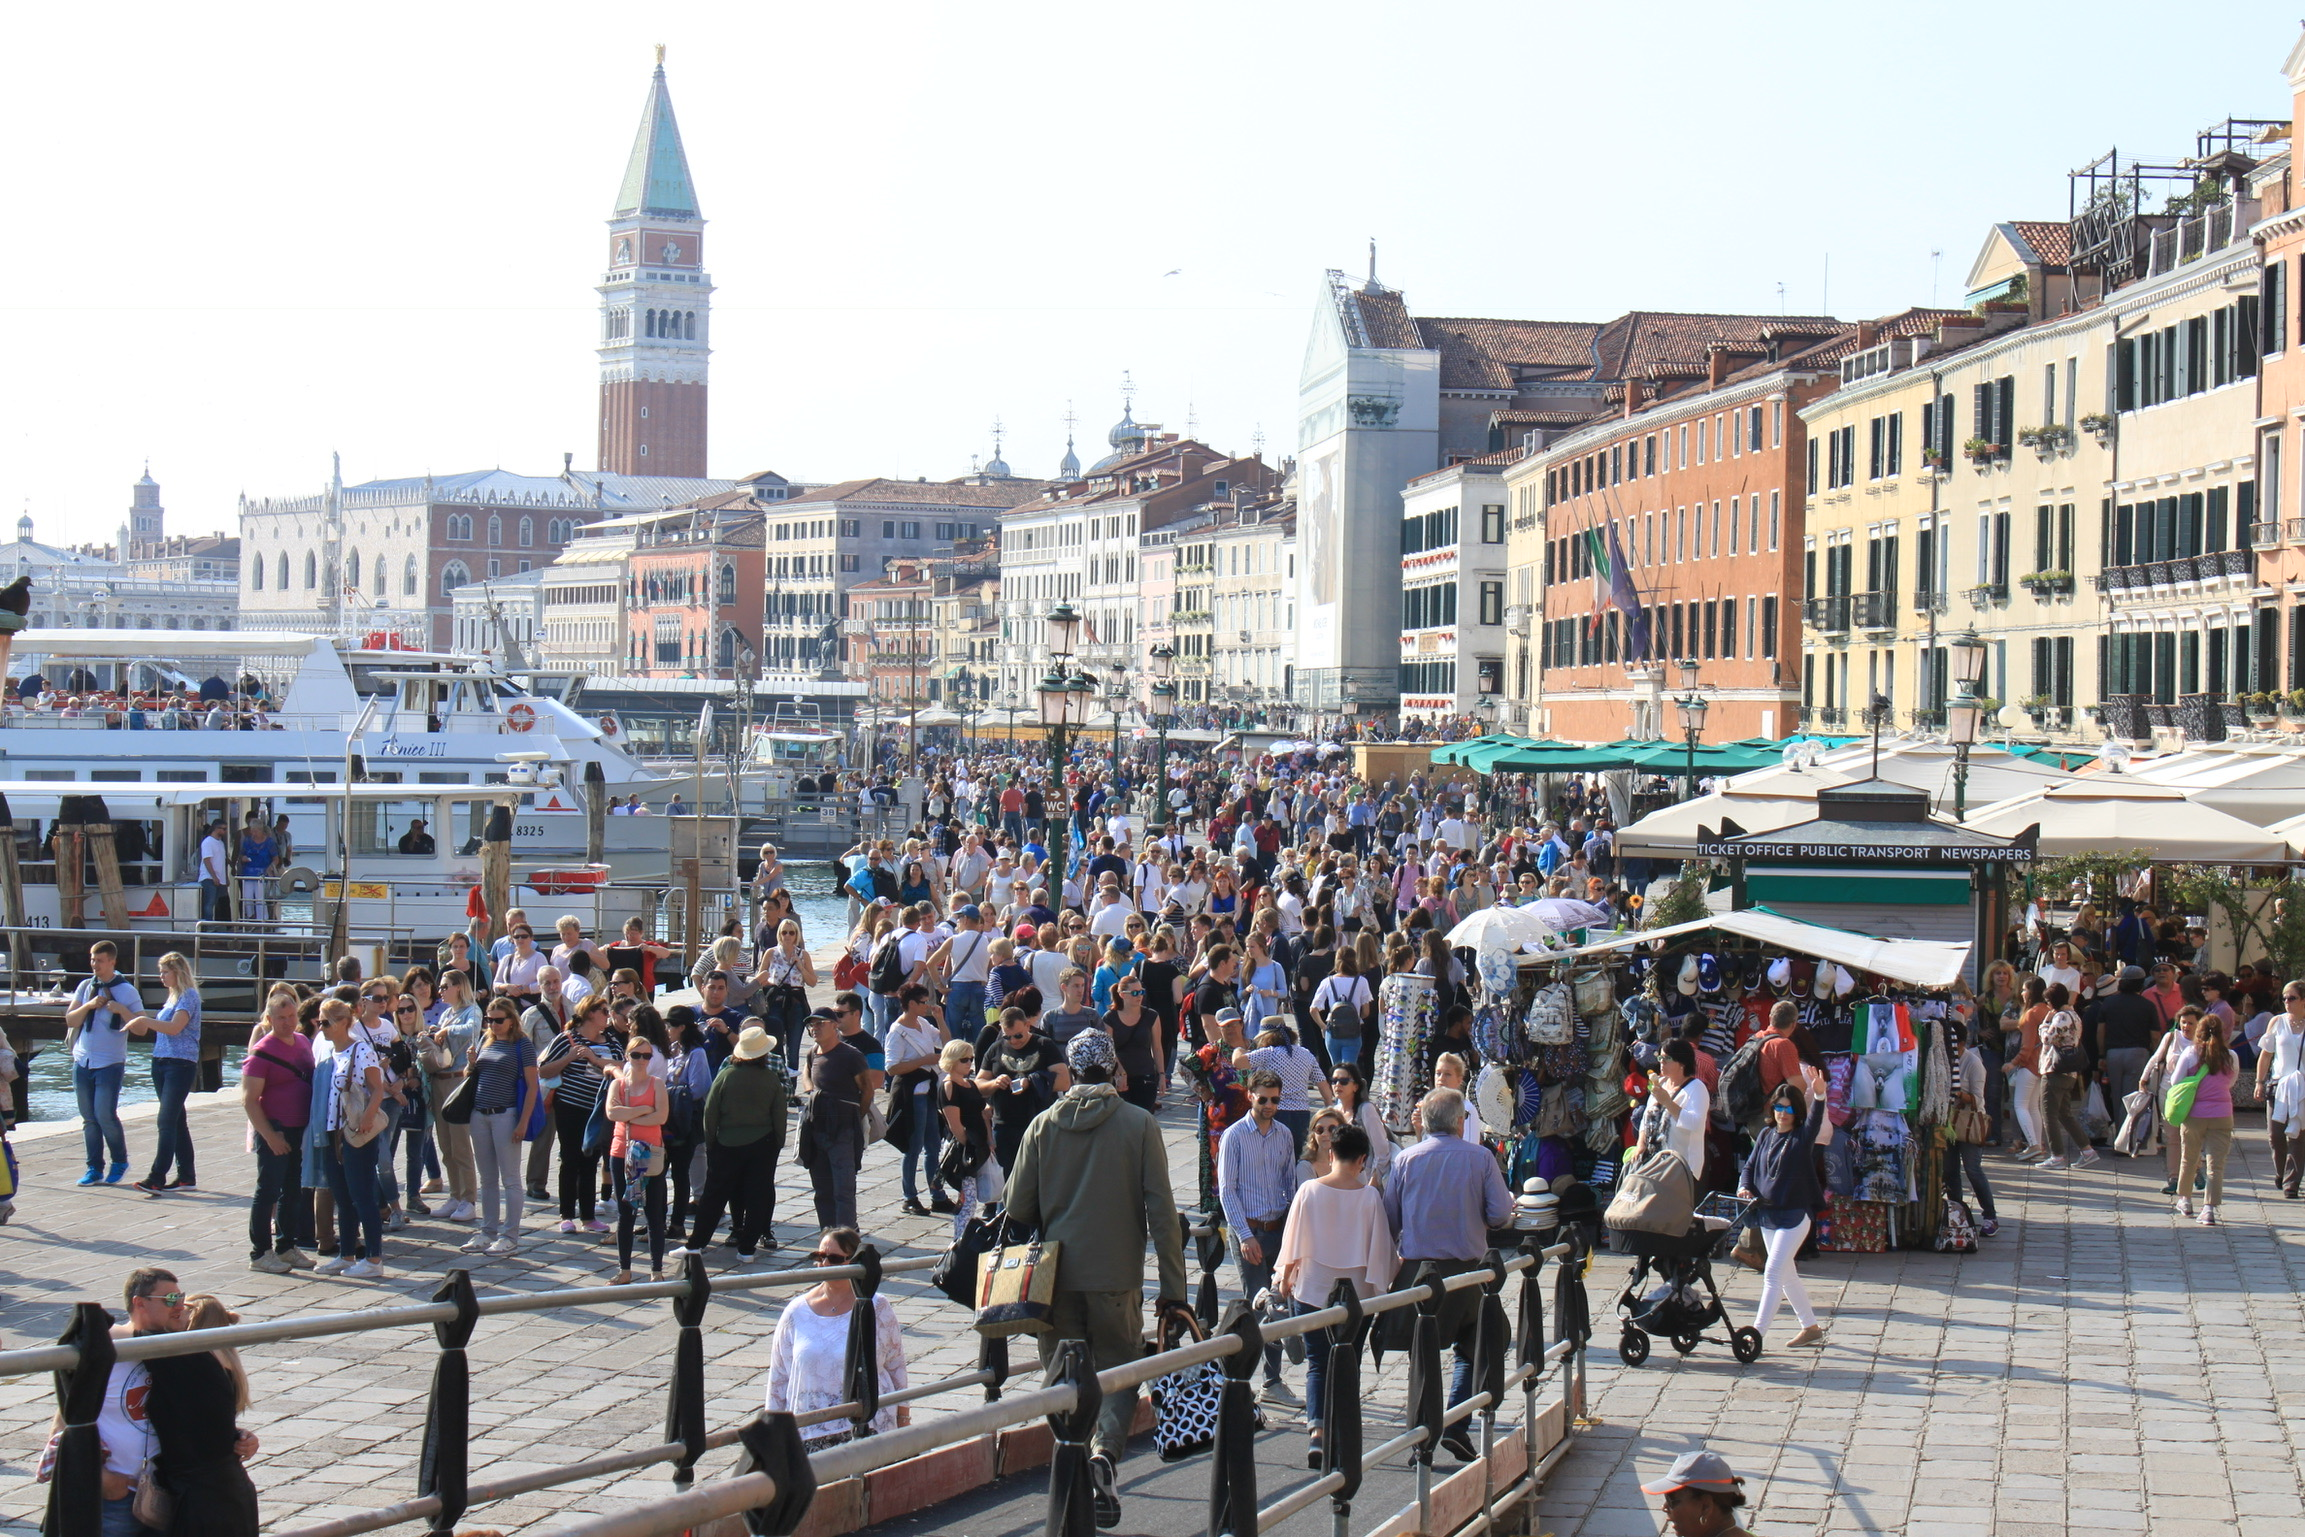 Tourist problem in Venice